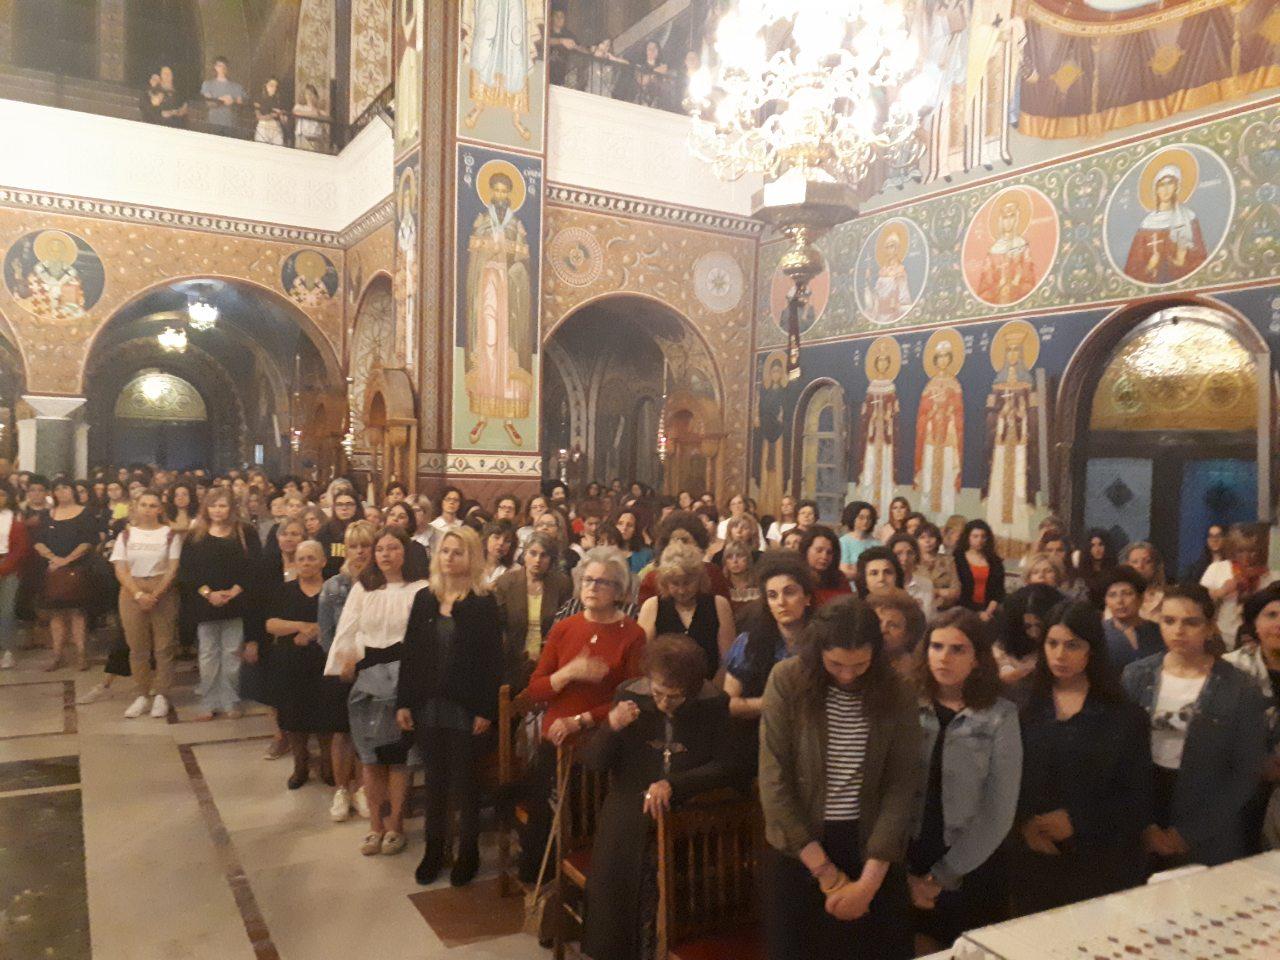 paraklisi ypopsifiwn 2019 3 - Παράκληση για τους υποψηφίους υων Πανελλαδικών Εξετάσεων τέλεσε ο Σεβασμιώτατος